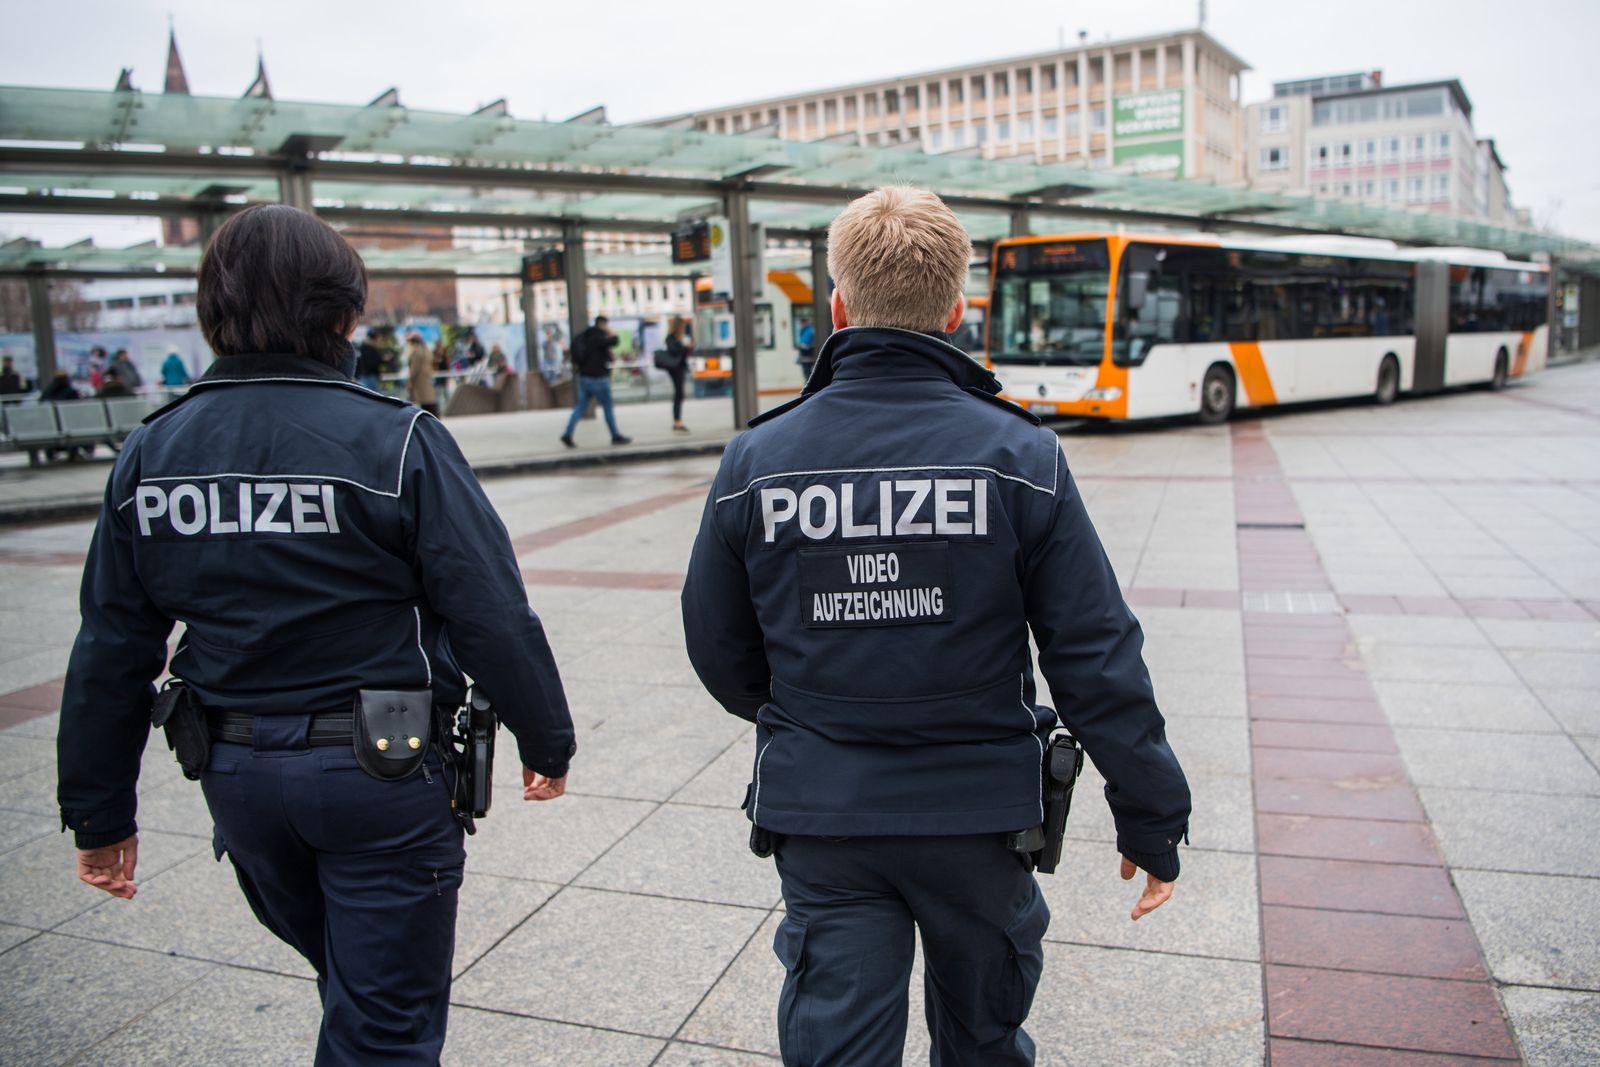 Pilotprojekt der Polizei am Berliner Platz